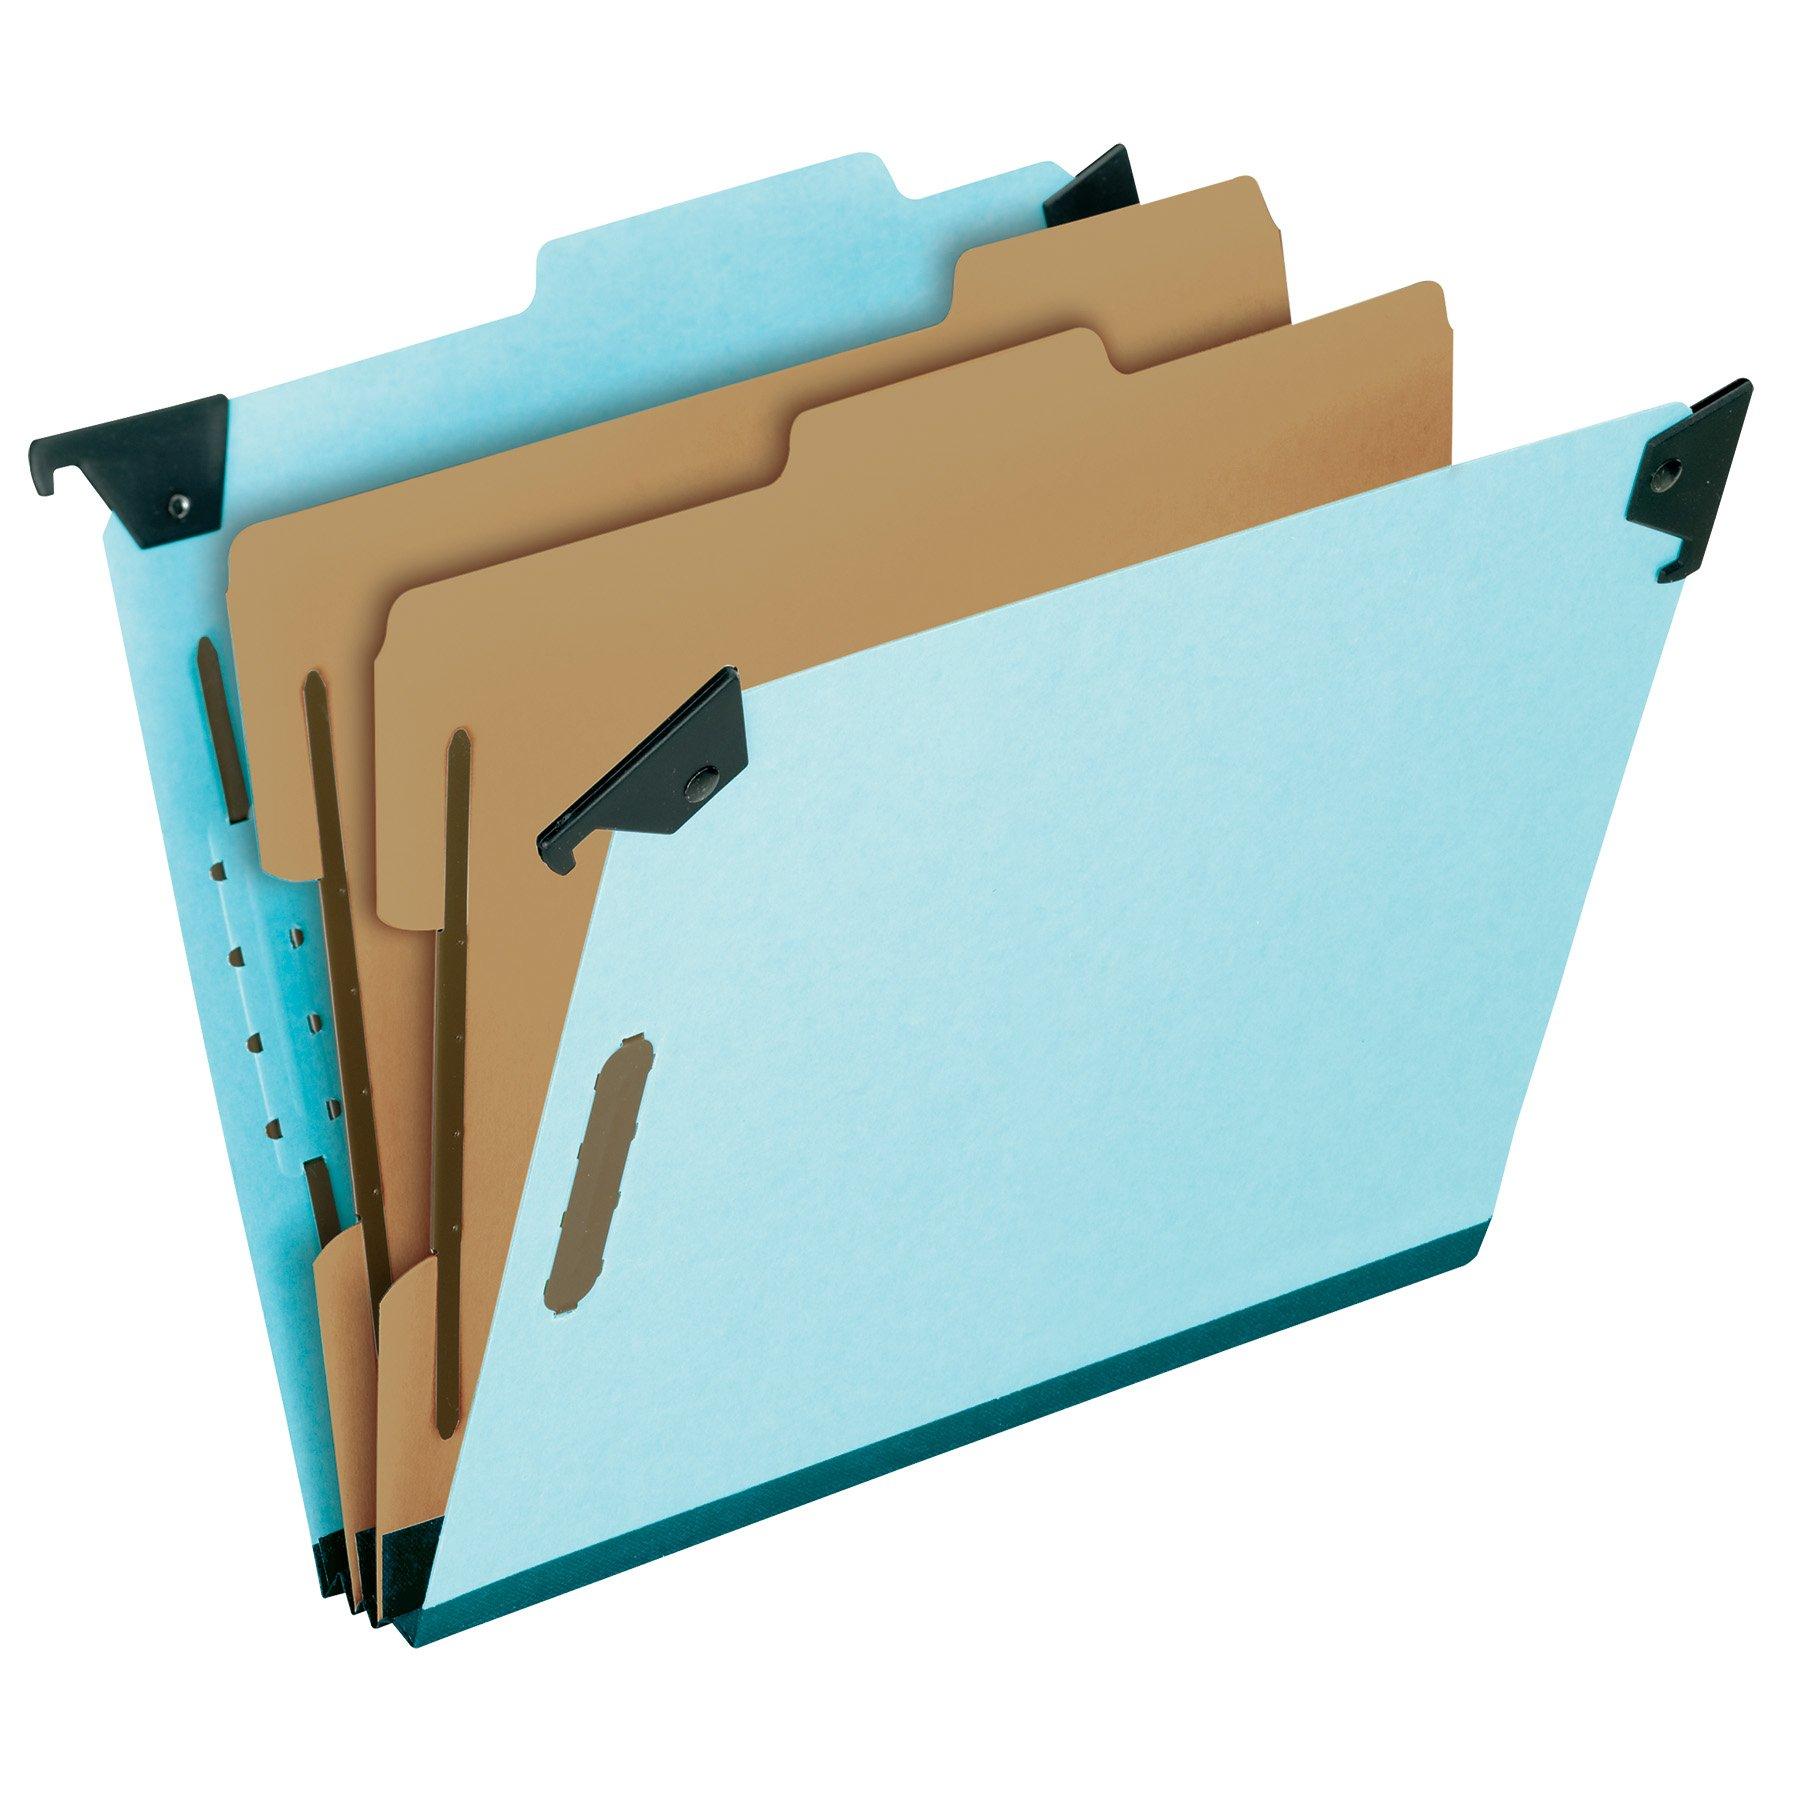 Pendaflex Hanging Classification Folders, Legal Size, 6 Section, 2'' Expansion, Blue, 1/3 Cut, 10/BX (59352EE) by Pendaflex